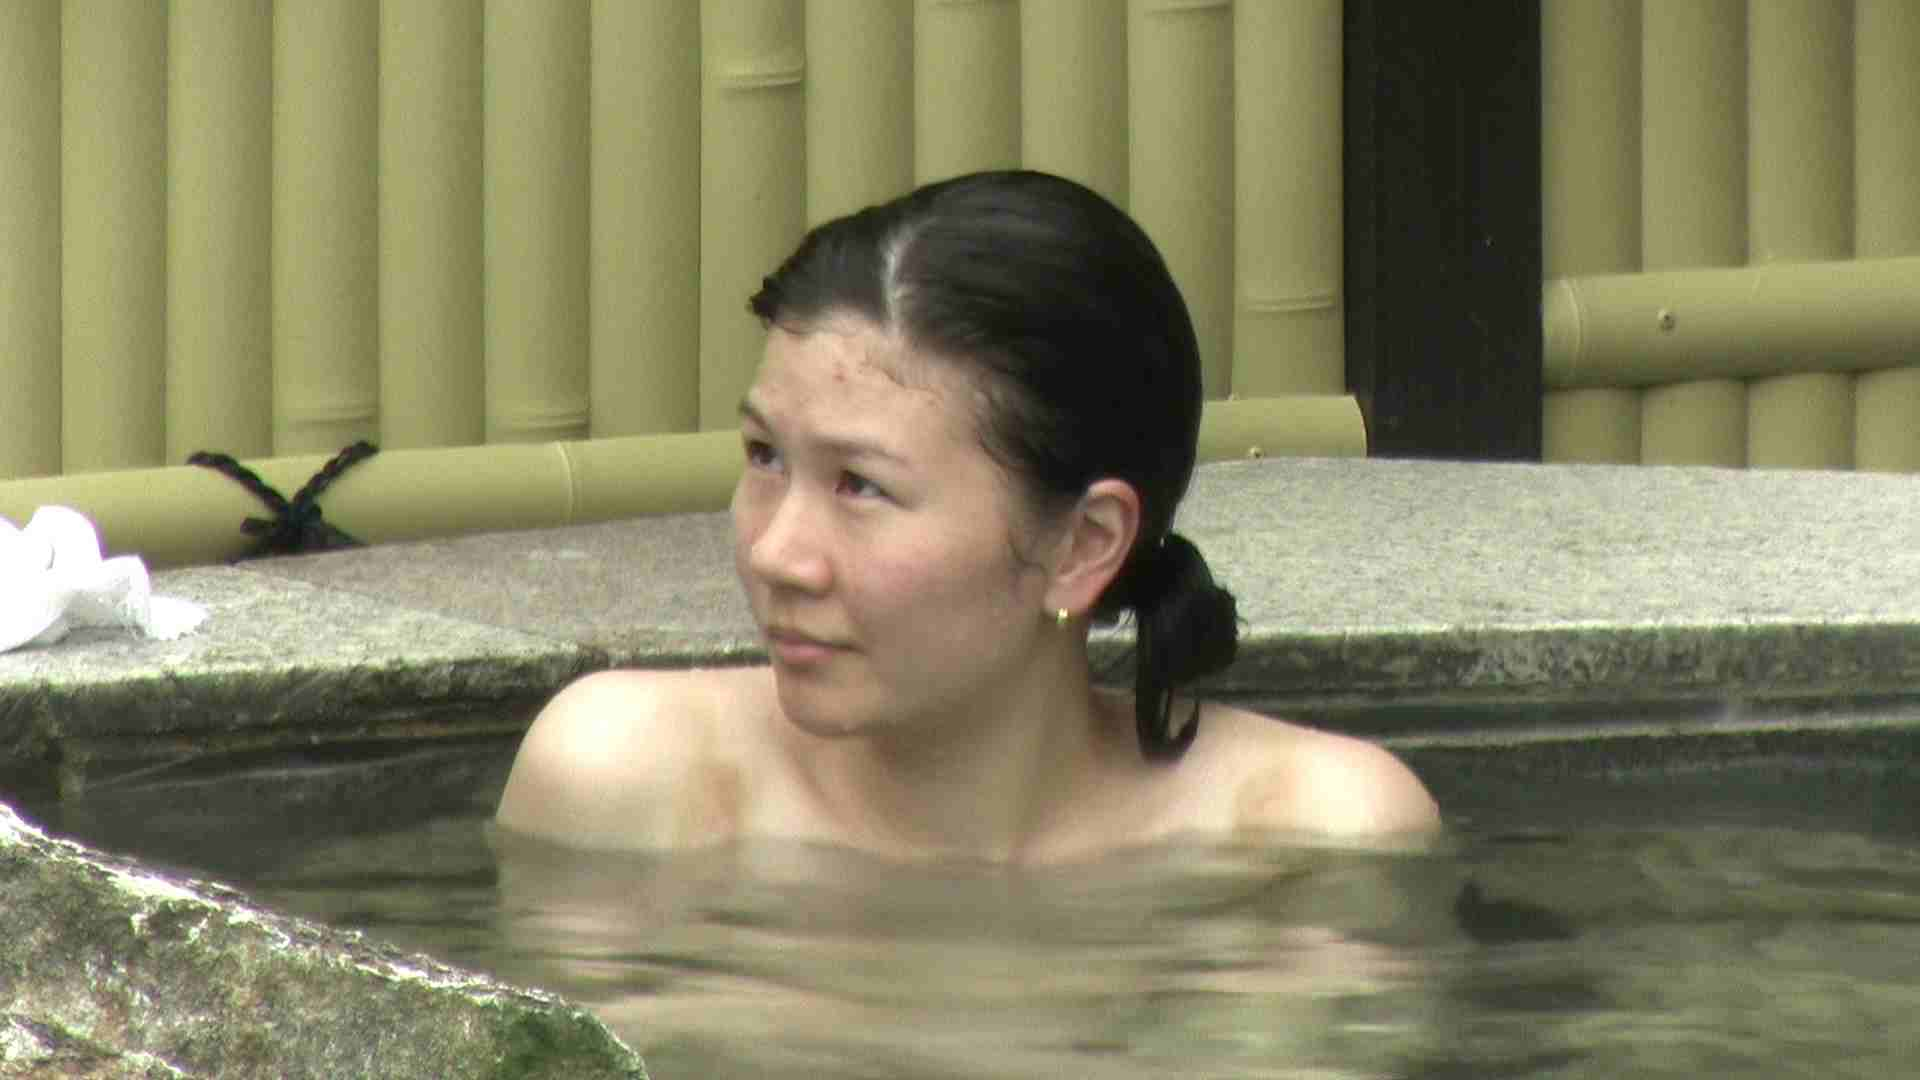 Aquaな露天風呂Vol.187 盗撮   HなOL  96pic 29